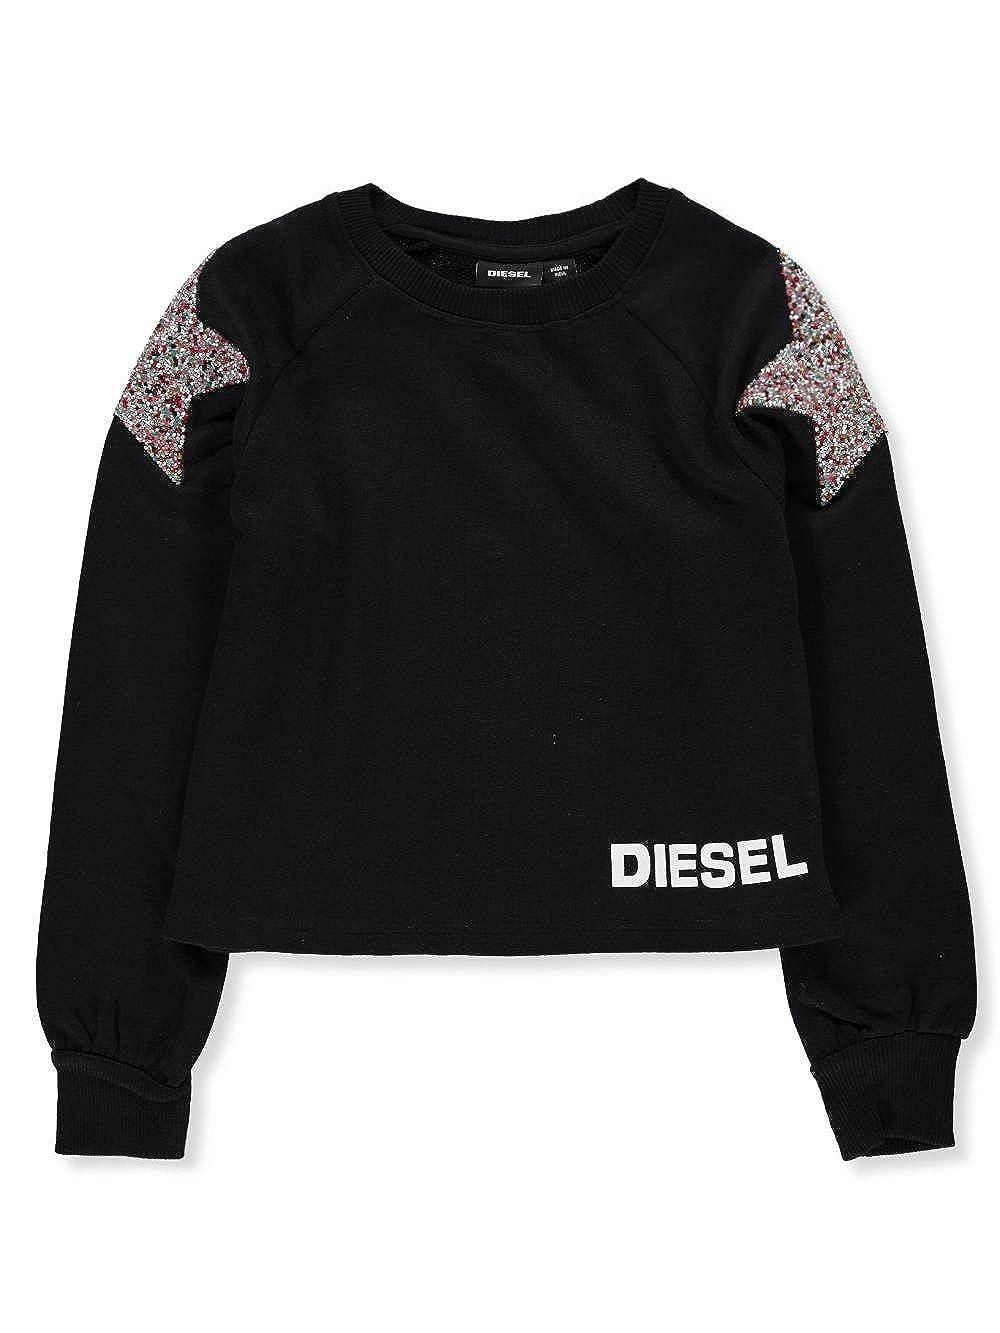 Diesel Girls' Sweatshirt Diesel Girls' Sweatshirt